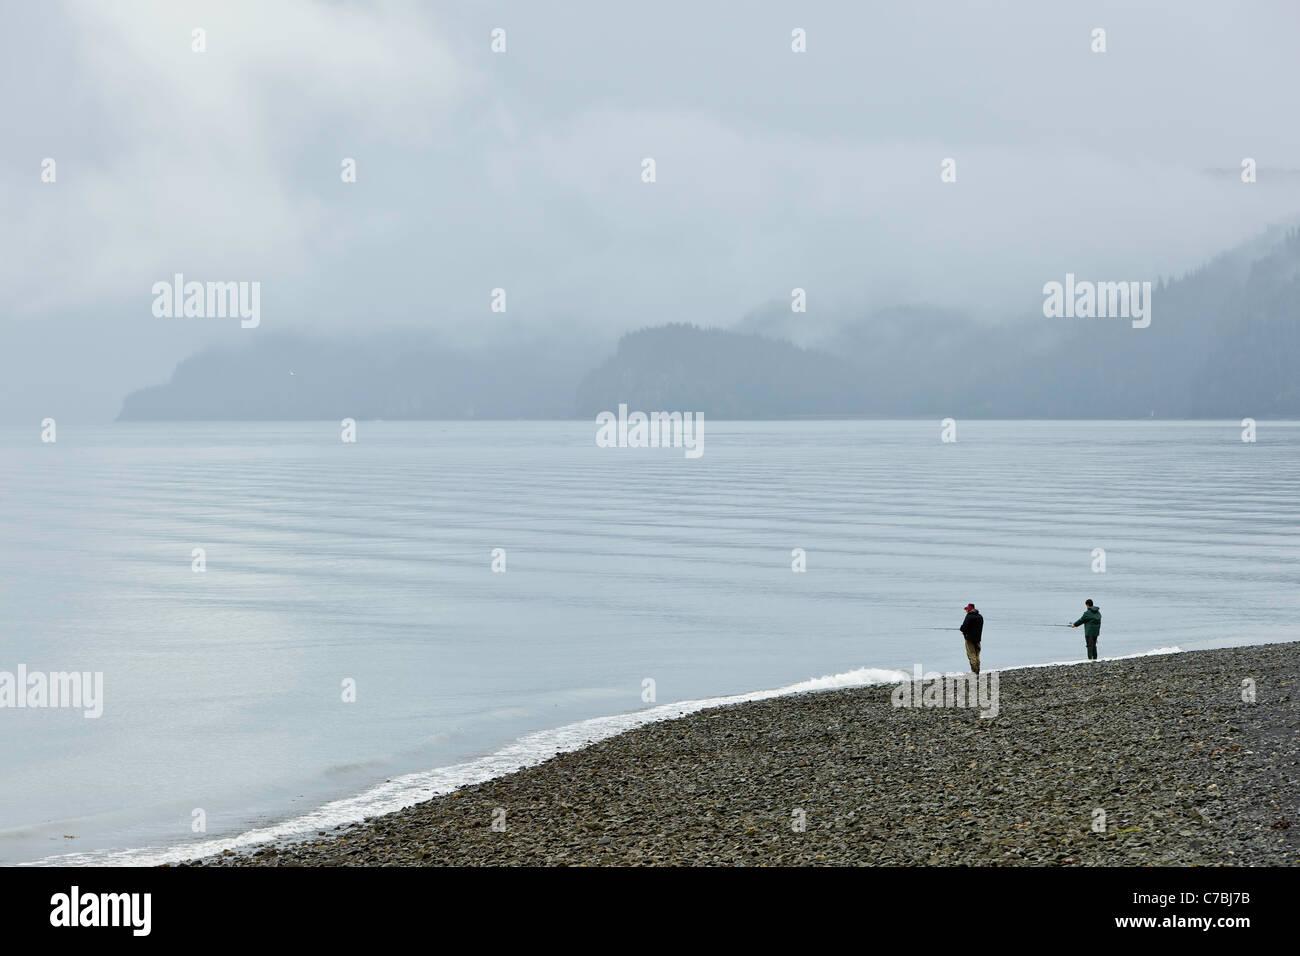 Two fishermen fishing for salmon in Resurrection Bay along Lowell Point in morning fog in Seward, Alaska. - Stock Image